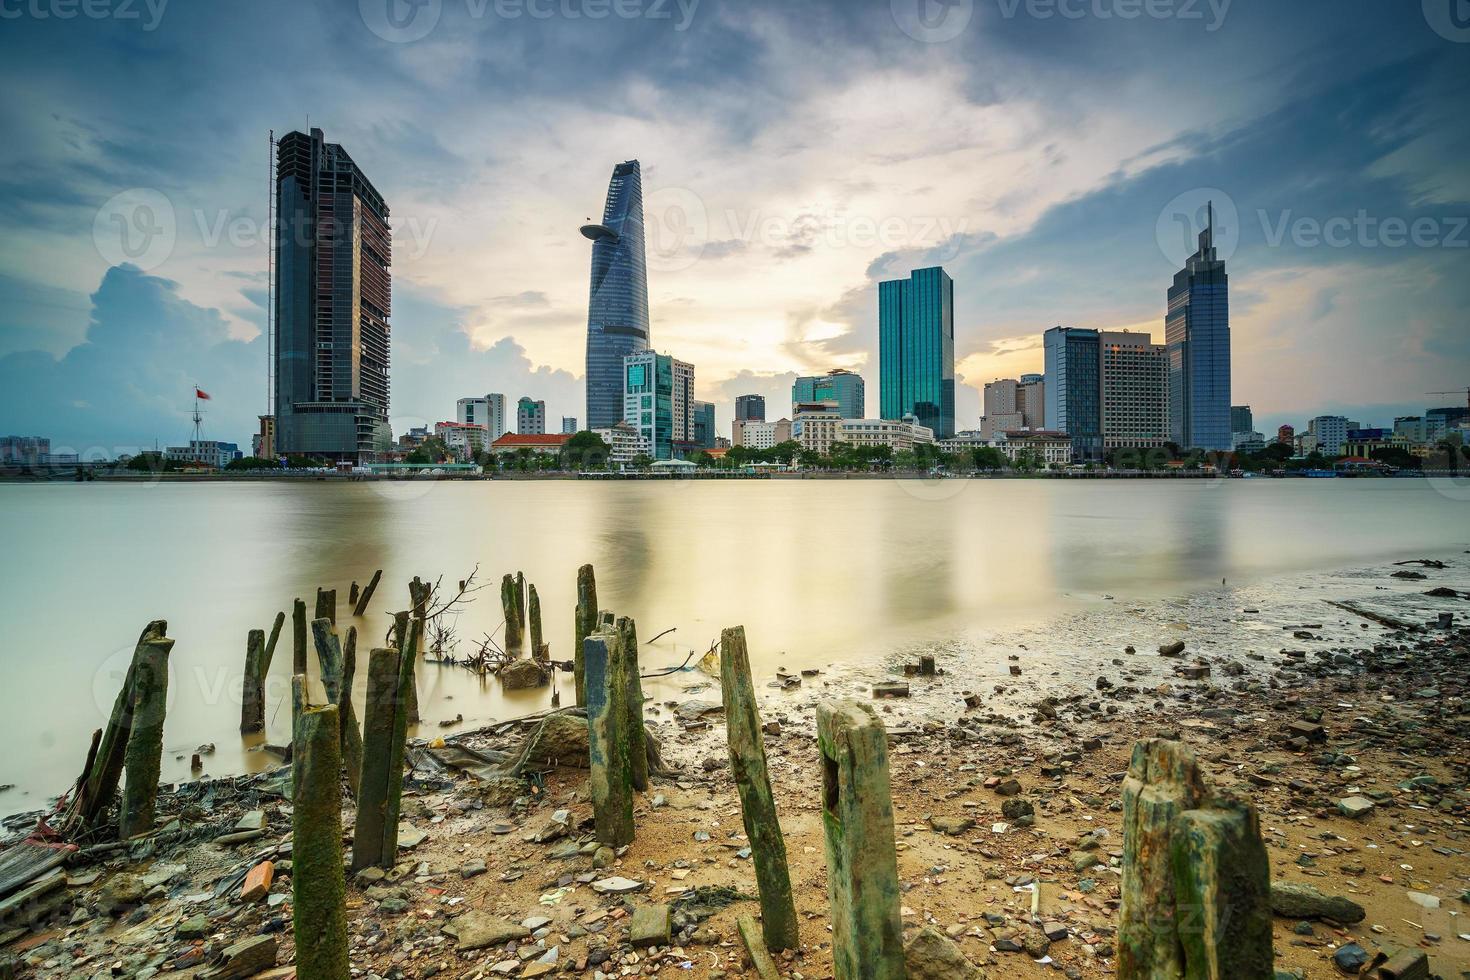 Innenstadt Saigon im Sonnenuntergang (HDR), Ho Chi Minh Stadt, Vietnam foto